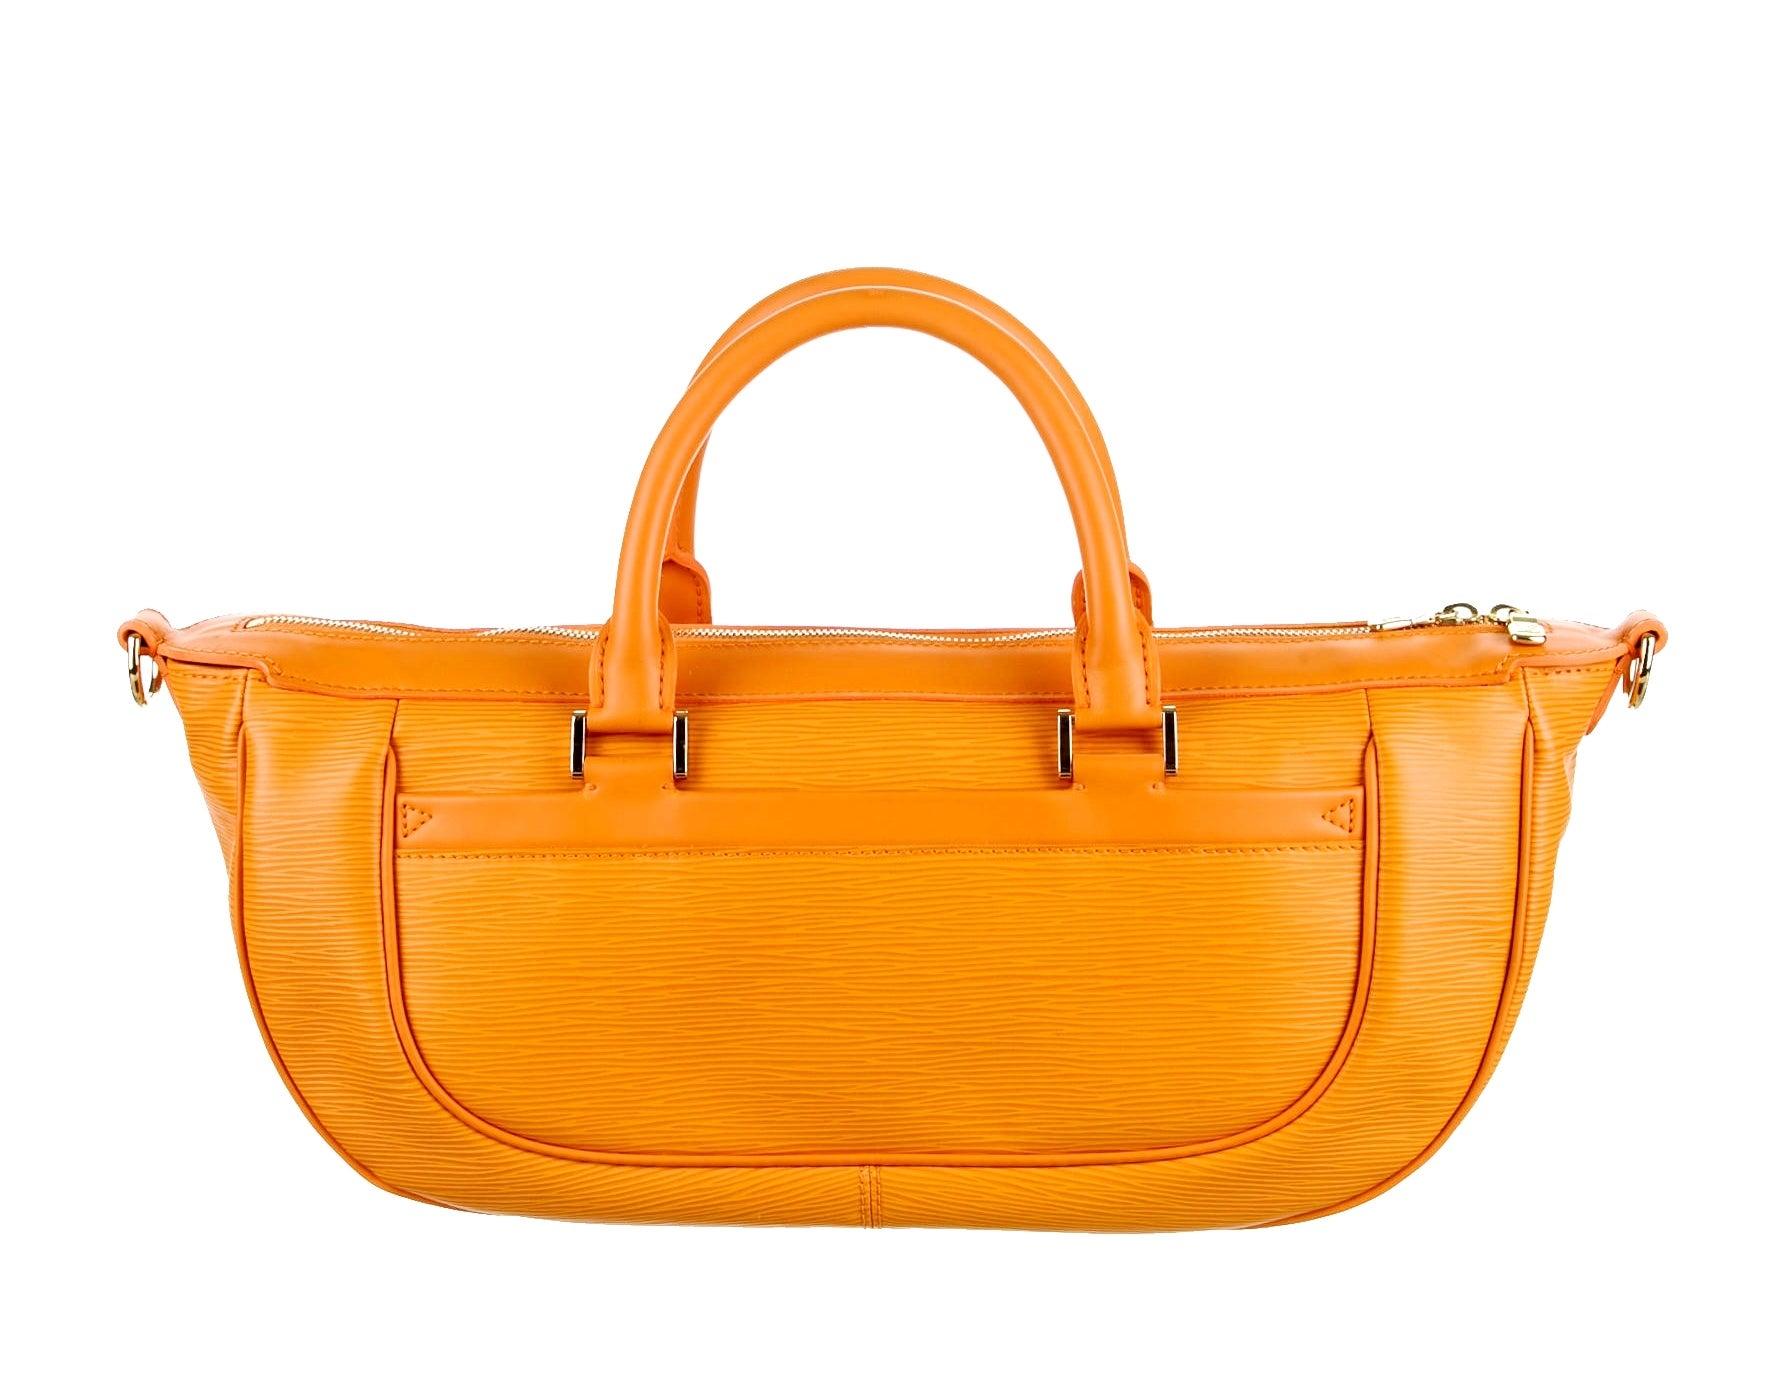 2e2fe266190b5 Louis Vuitton Epi Orange Leather Medium Size Weekender Handbag For Sale at  1stdibs